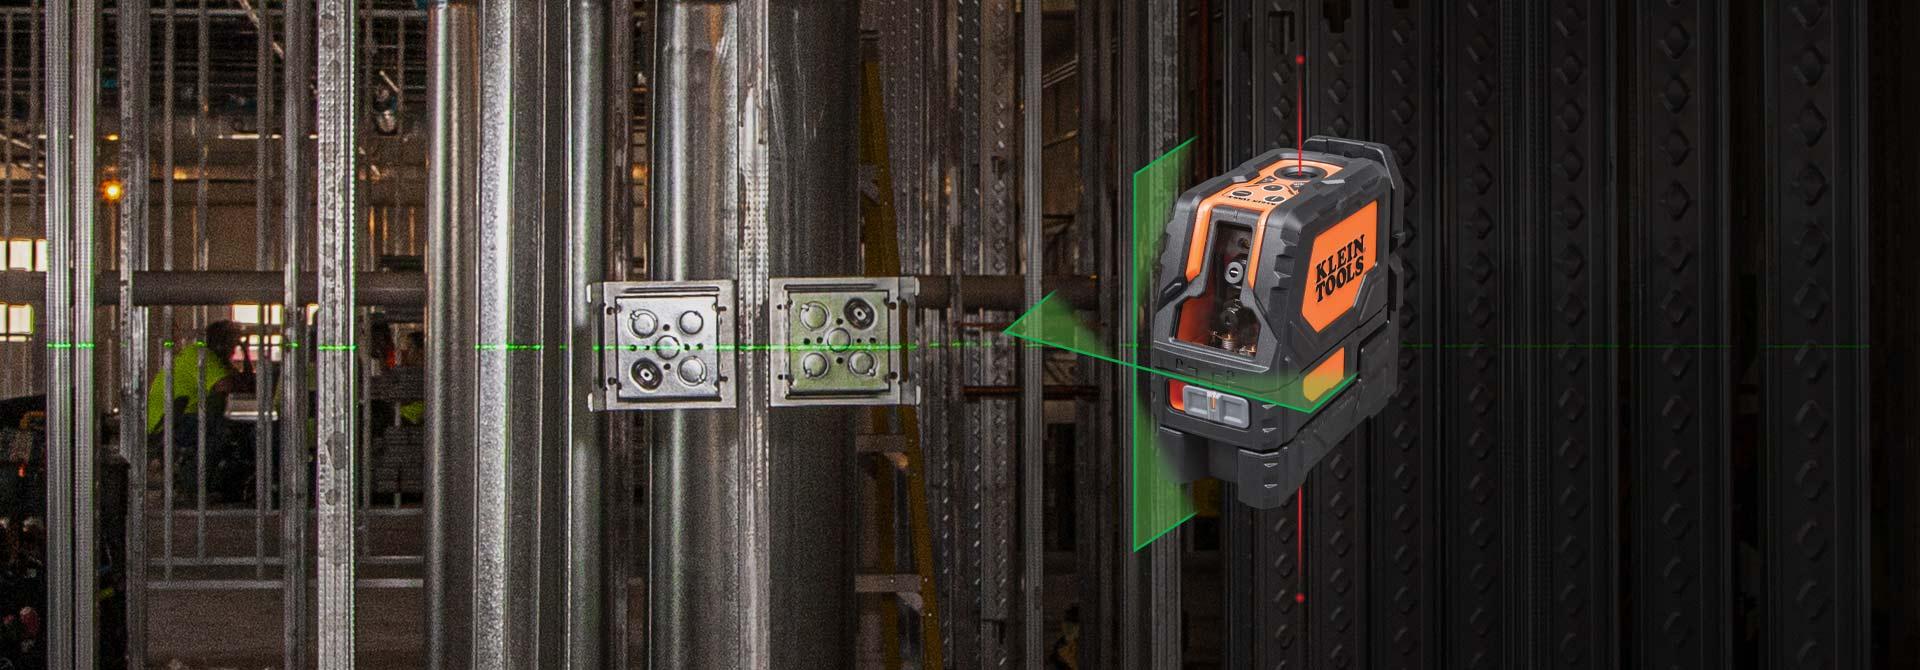 Self-Leveling \r\nCross-Line Laser Level